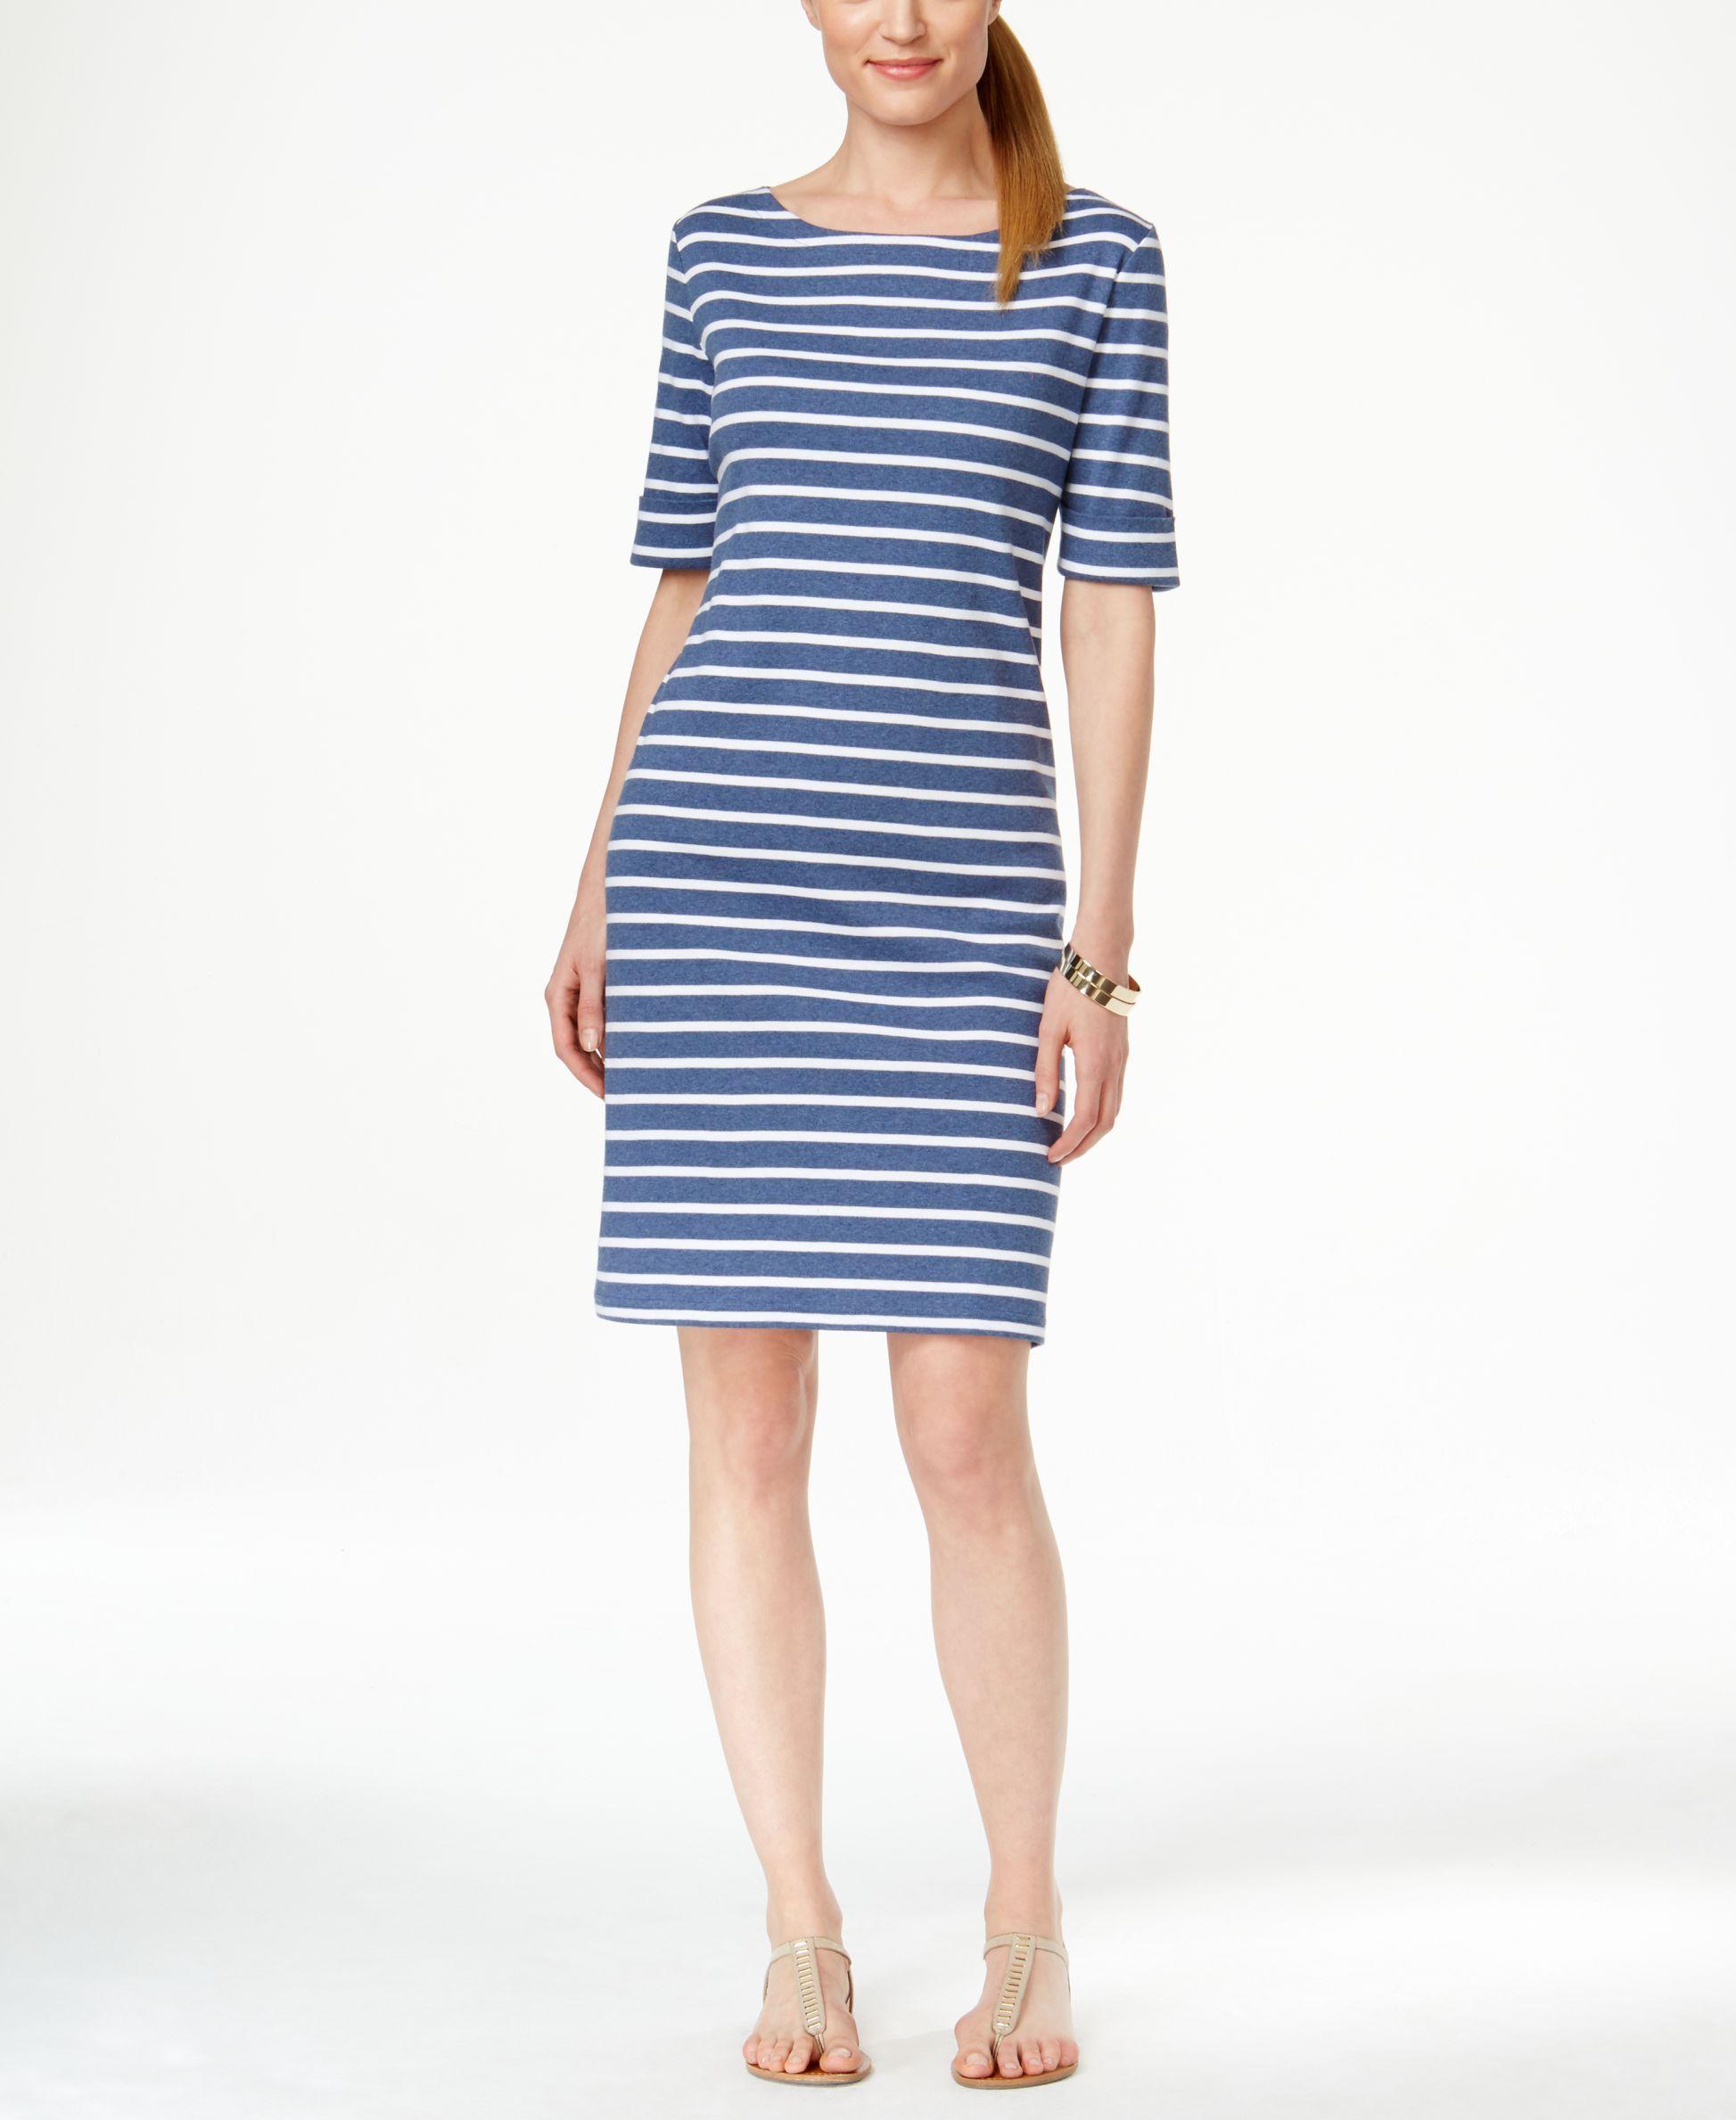 Karen scott striped shortsleeve dress only at macyus products